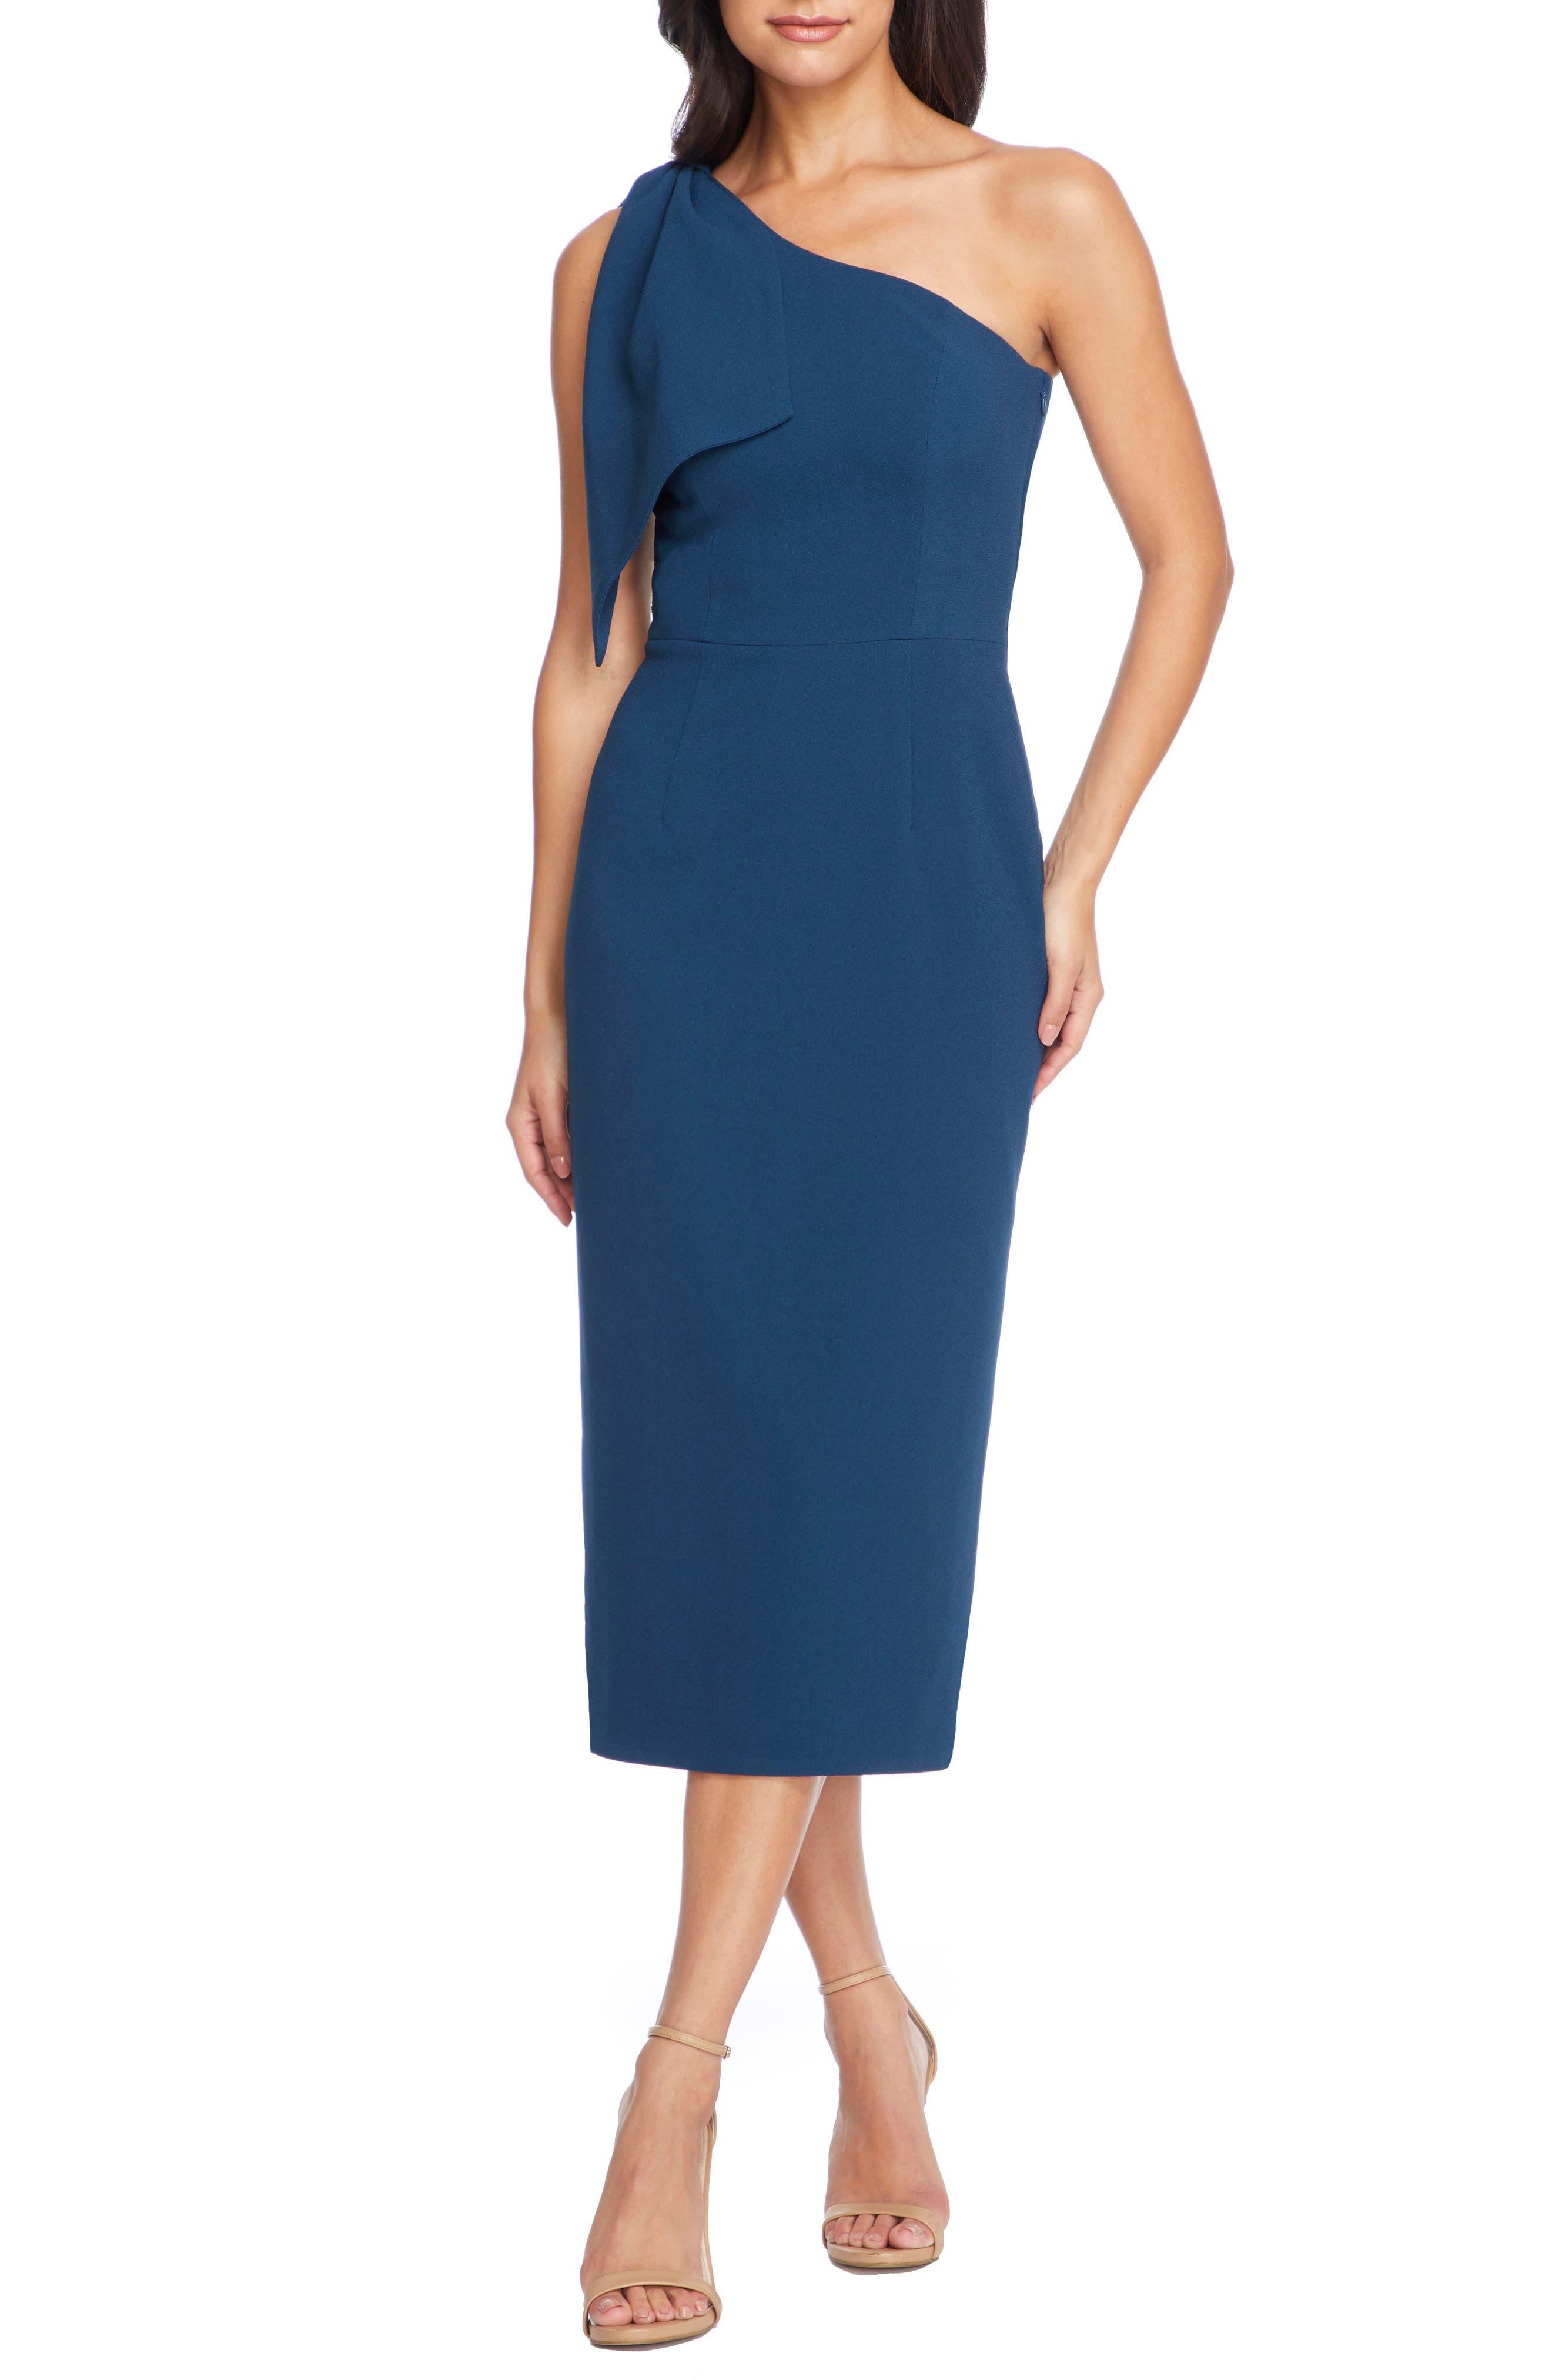 Dress The Population Tiffany One-Shoulder Midi Dress